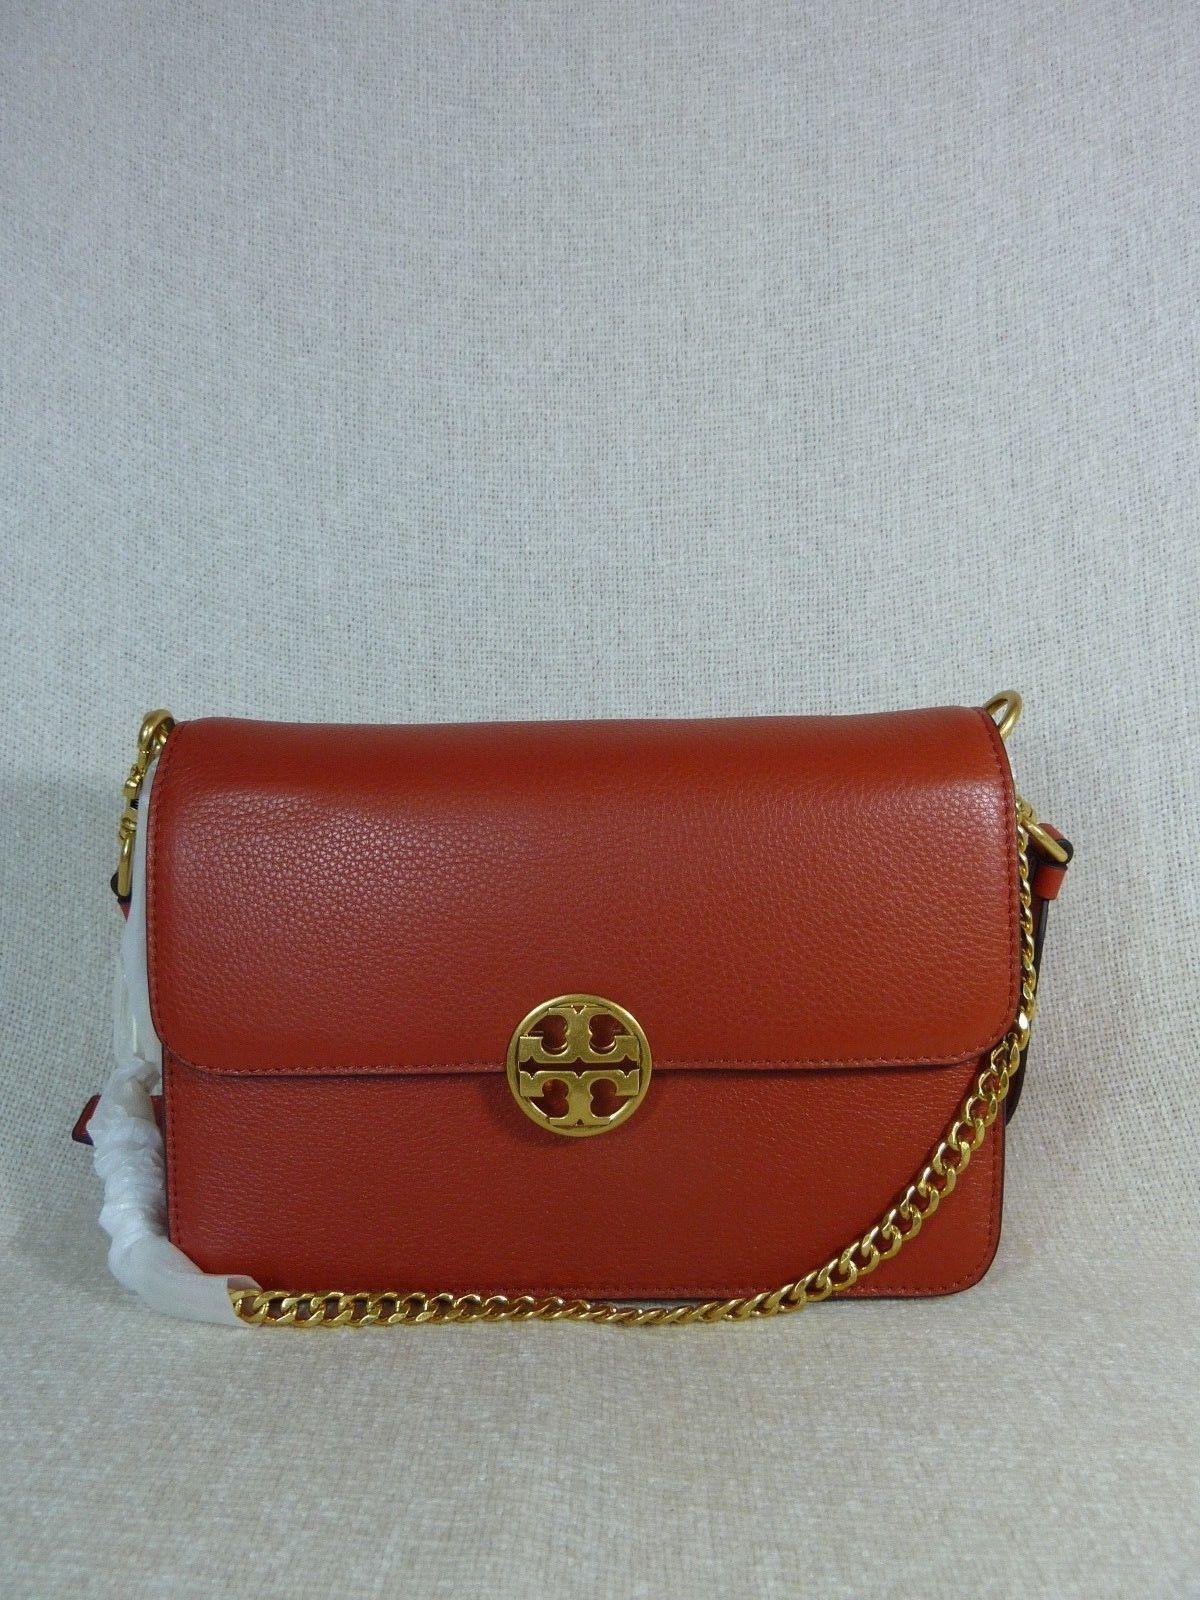 NWT Tory Burch Kola Chelsea Convertible Shoulder Bag  - $498 image 4